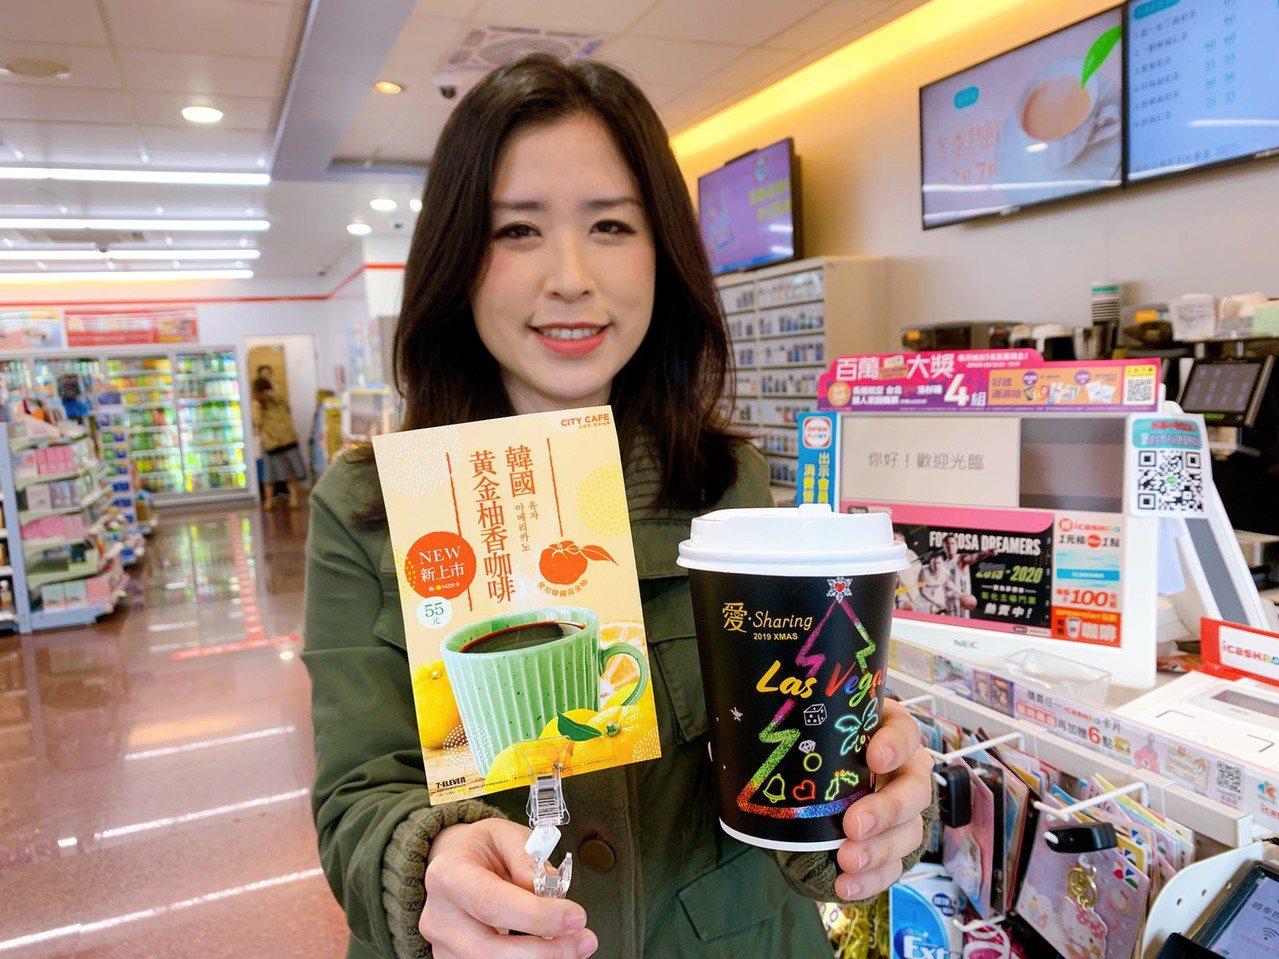 7-ELEVEN CITY CAFE新推出「韓國黃金柚香咖啡」,中杯熱飲售價55...